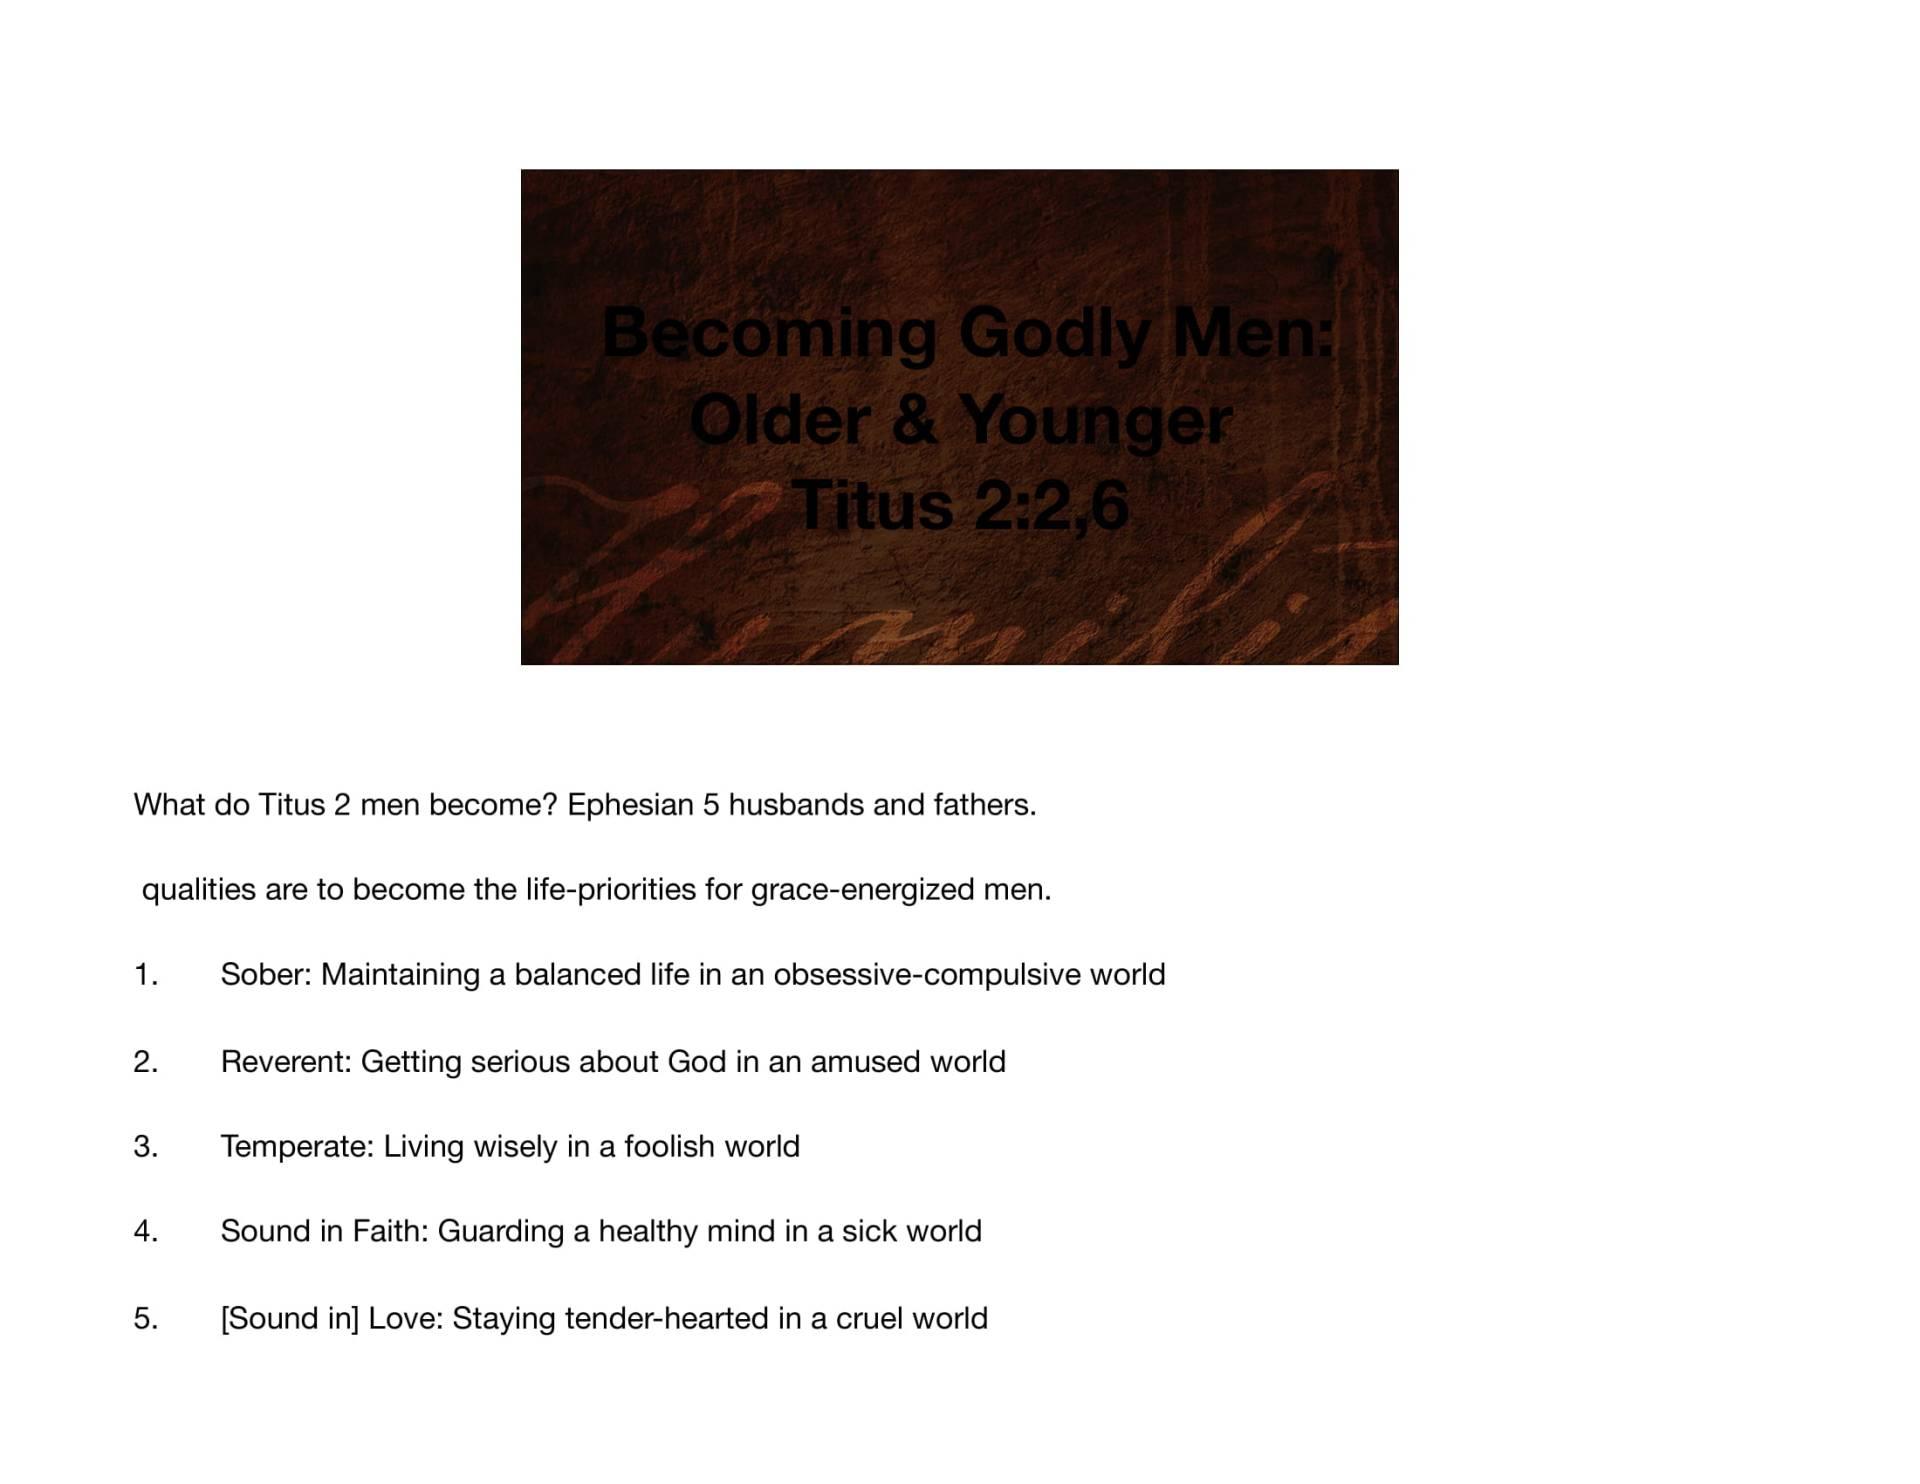 LGI-04 - Caution Men - Spiritual Maturity Is Not Automatic-11